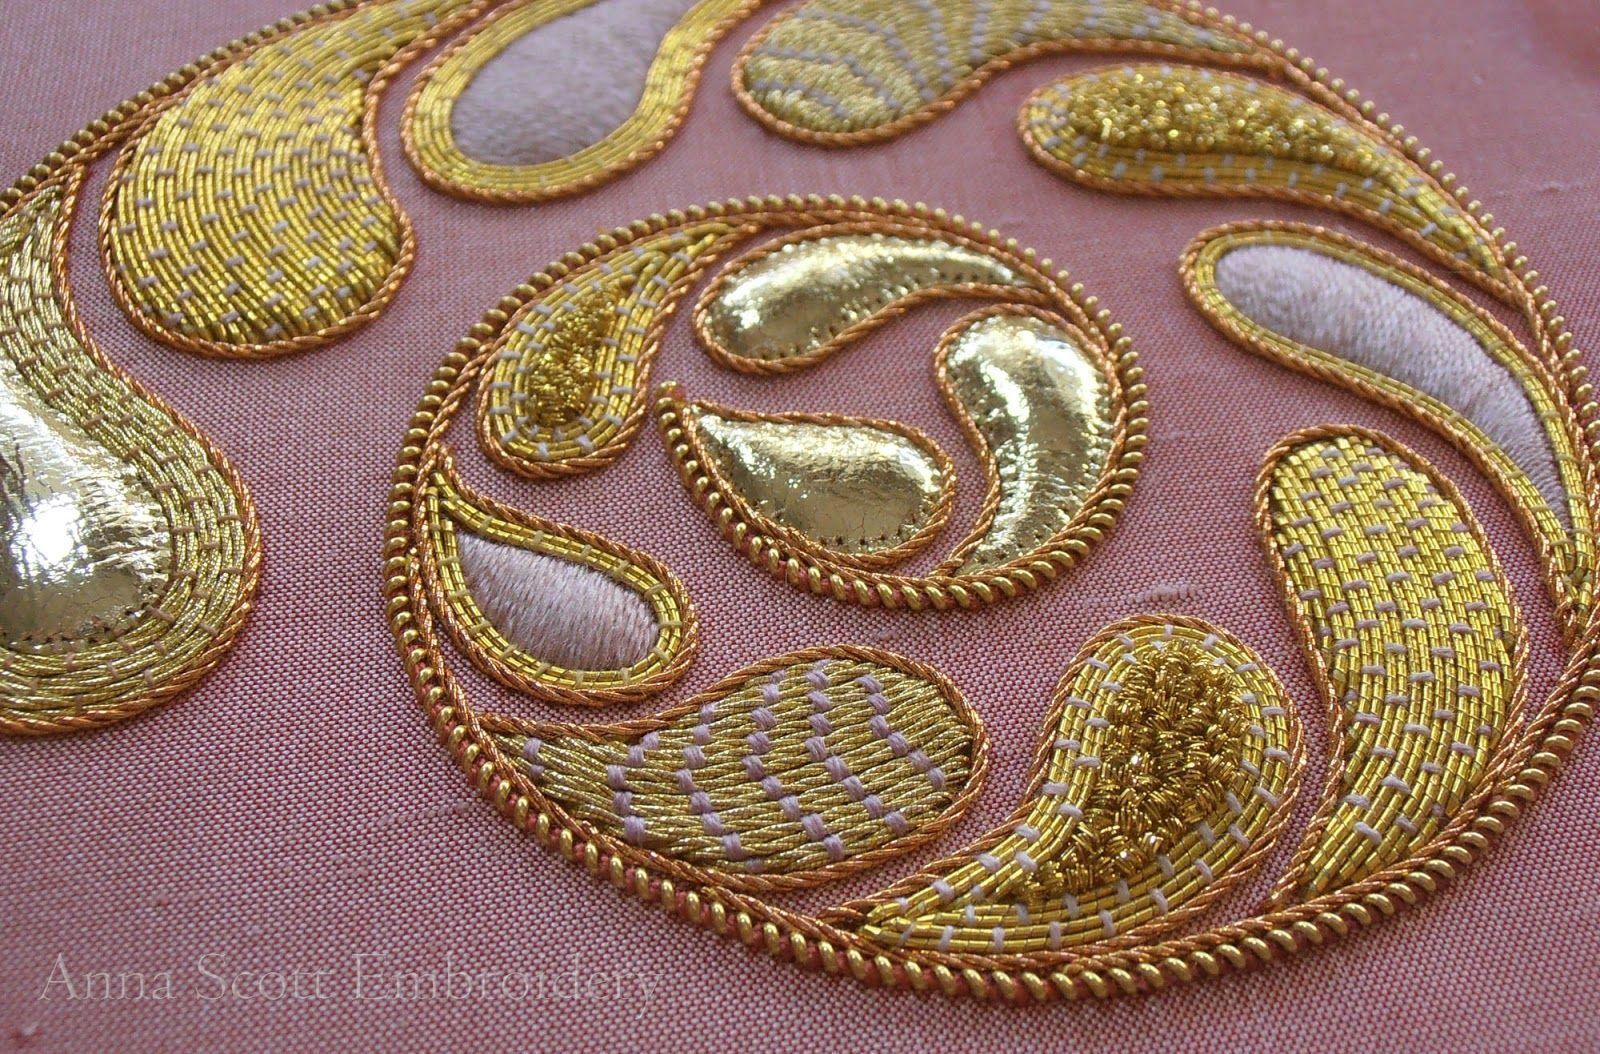 Nautilus Goldwork Embroidery ~ by Anna Scott#anna #embroidery #goldwork #nautilus #scott